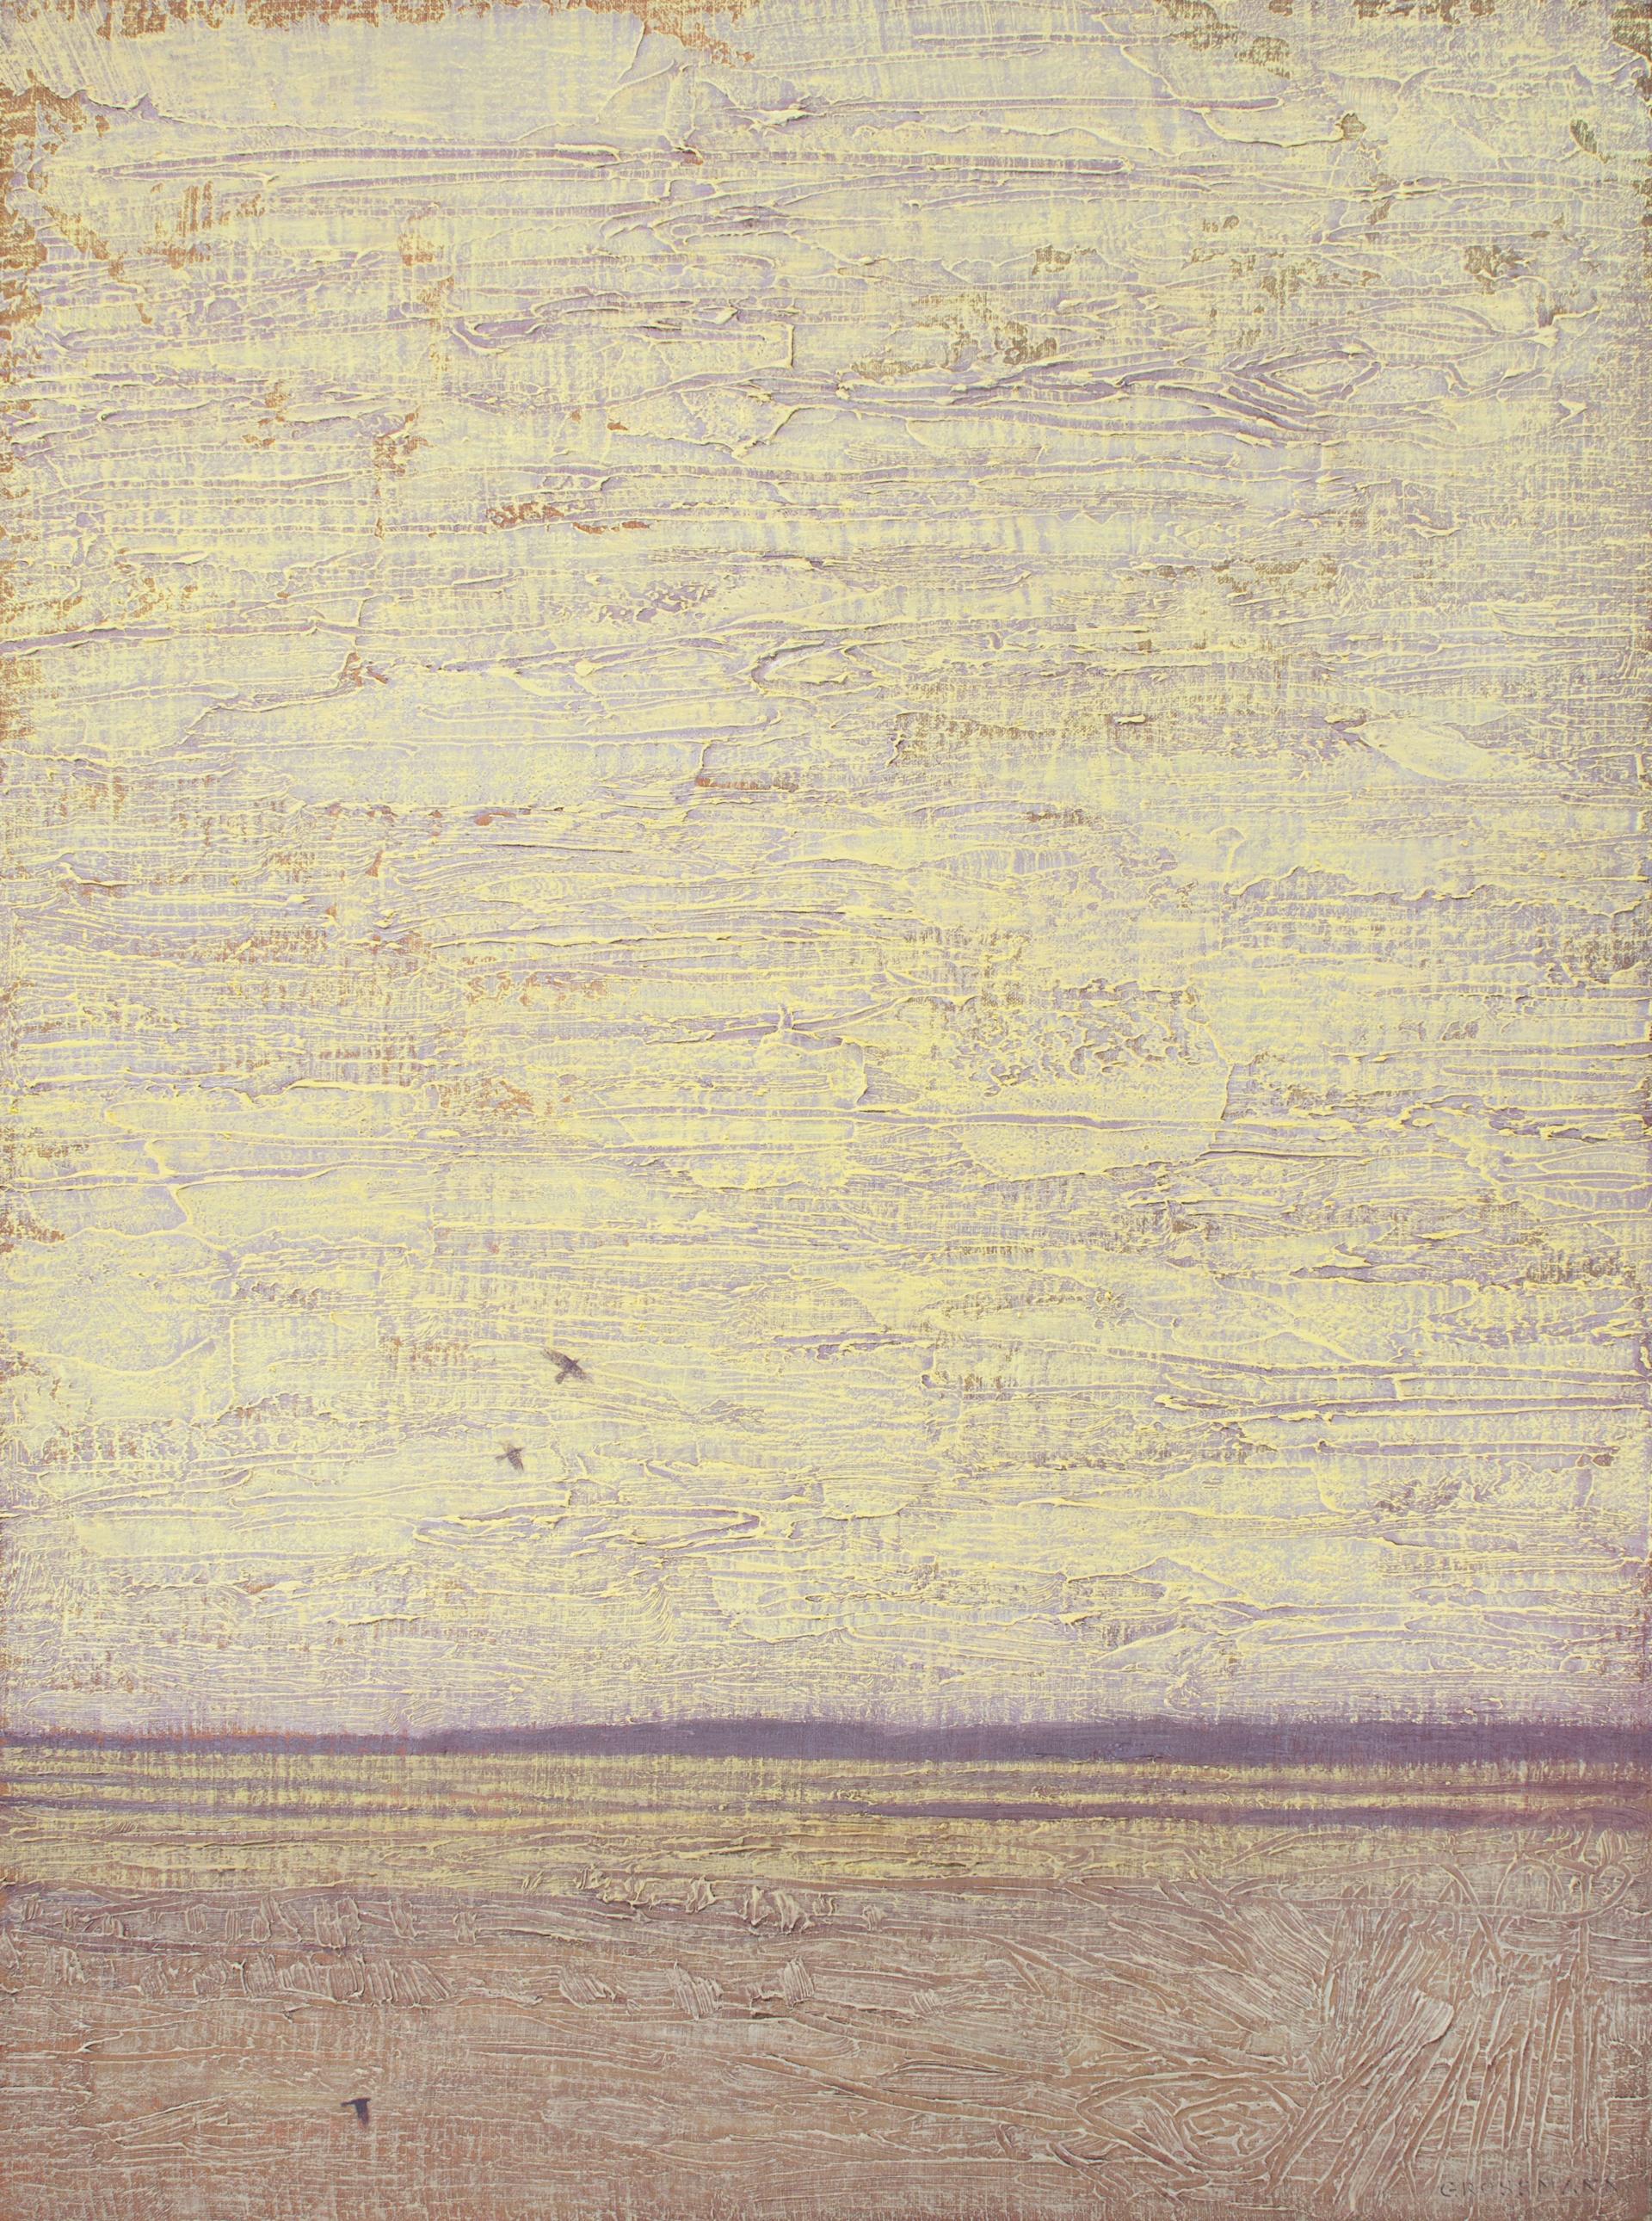 Flight on Textured Sky by David Grossmann